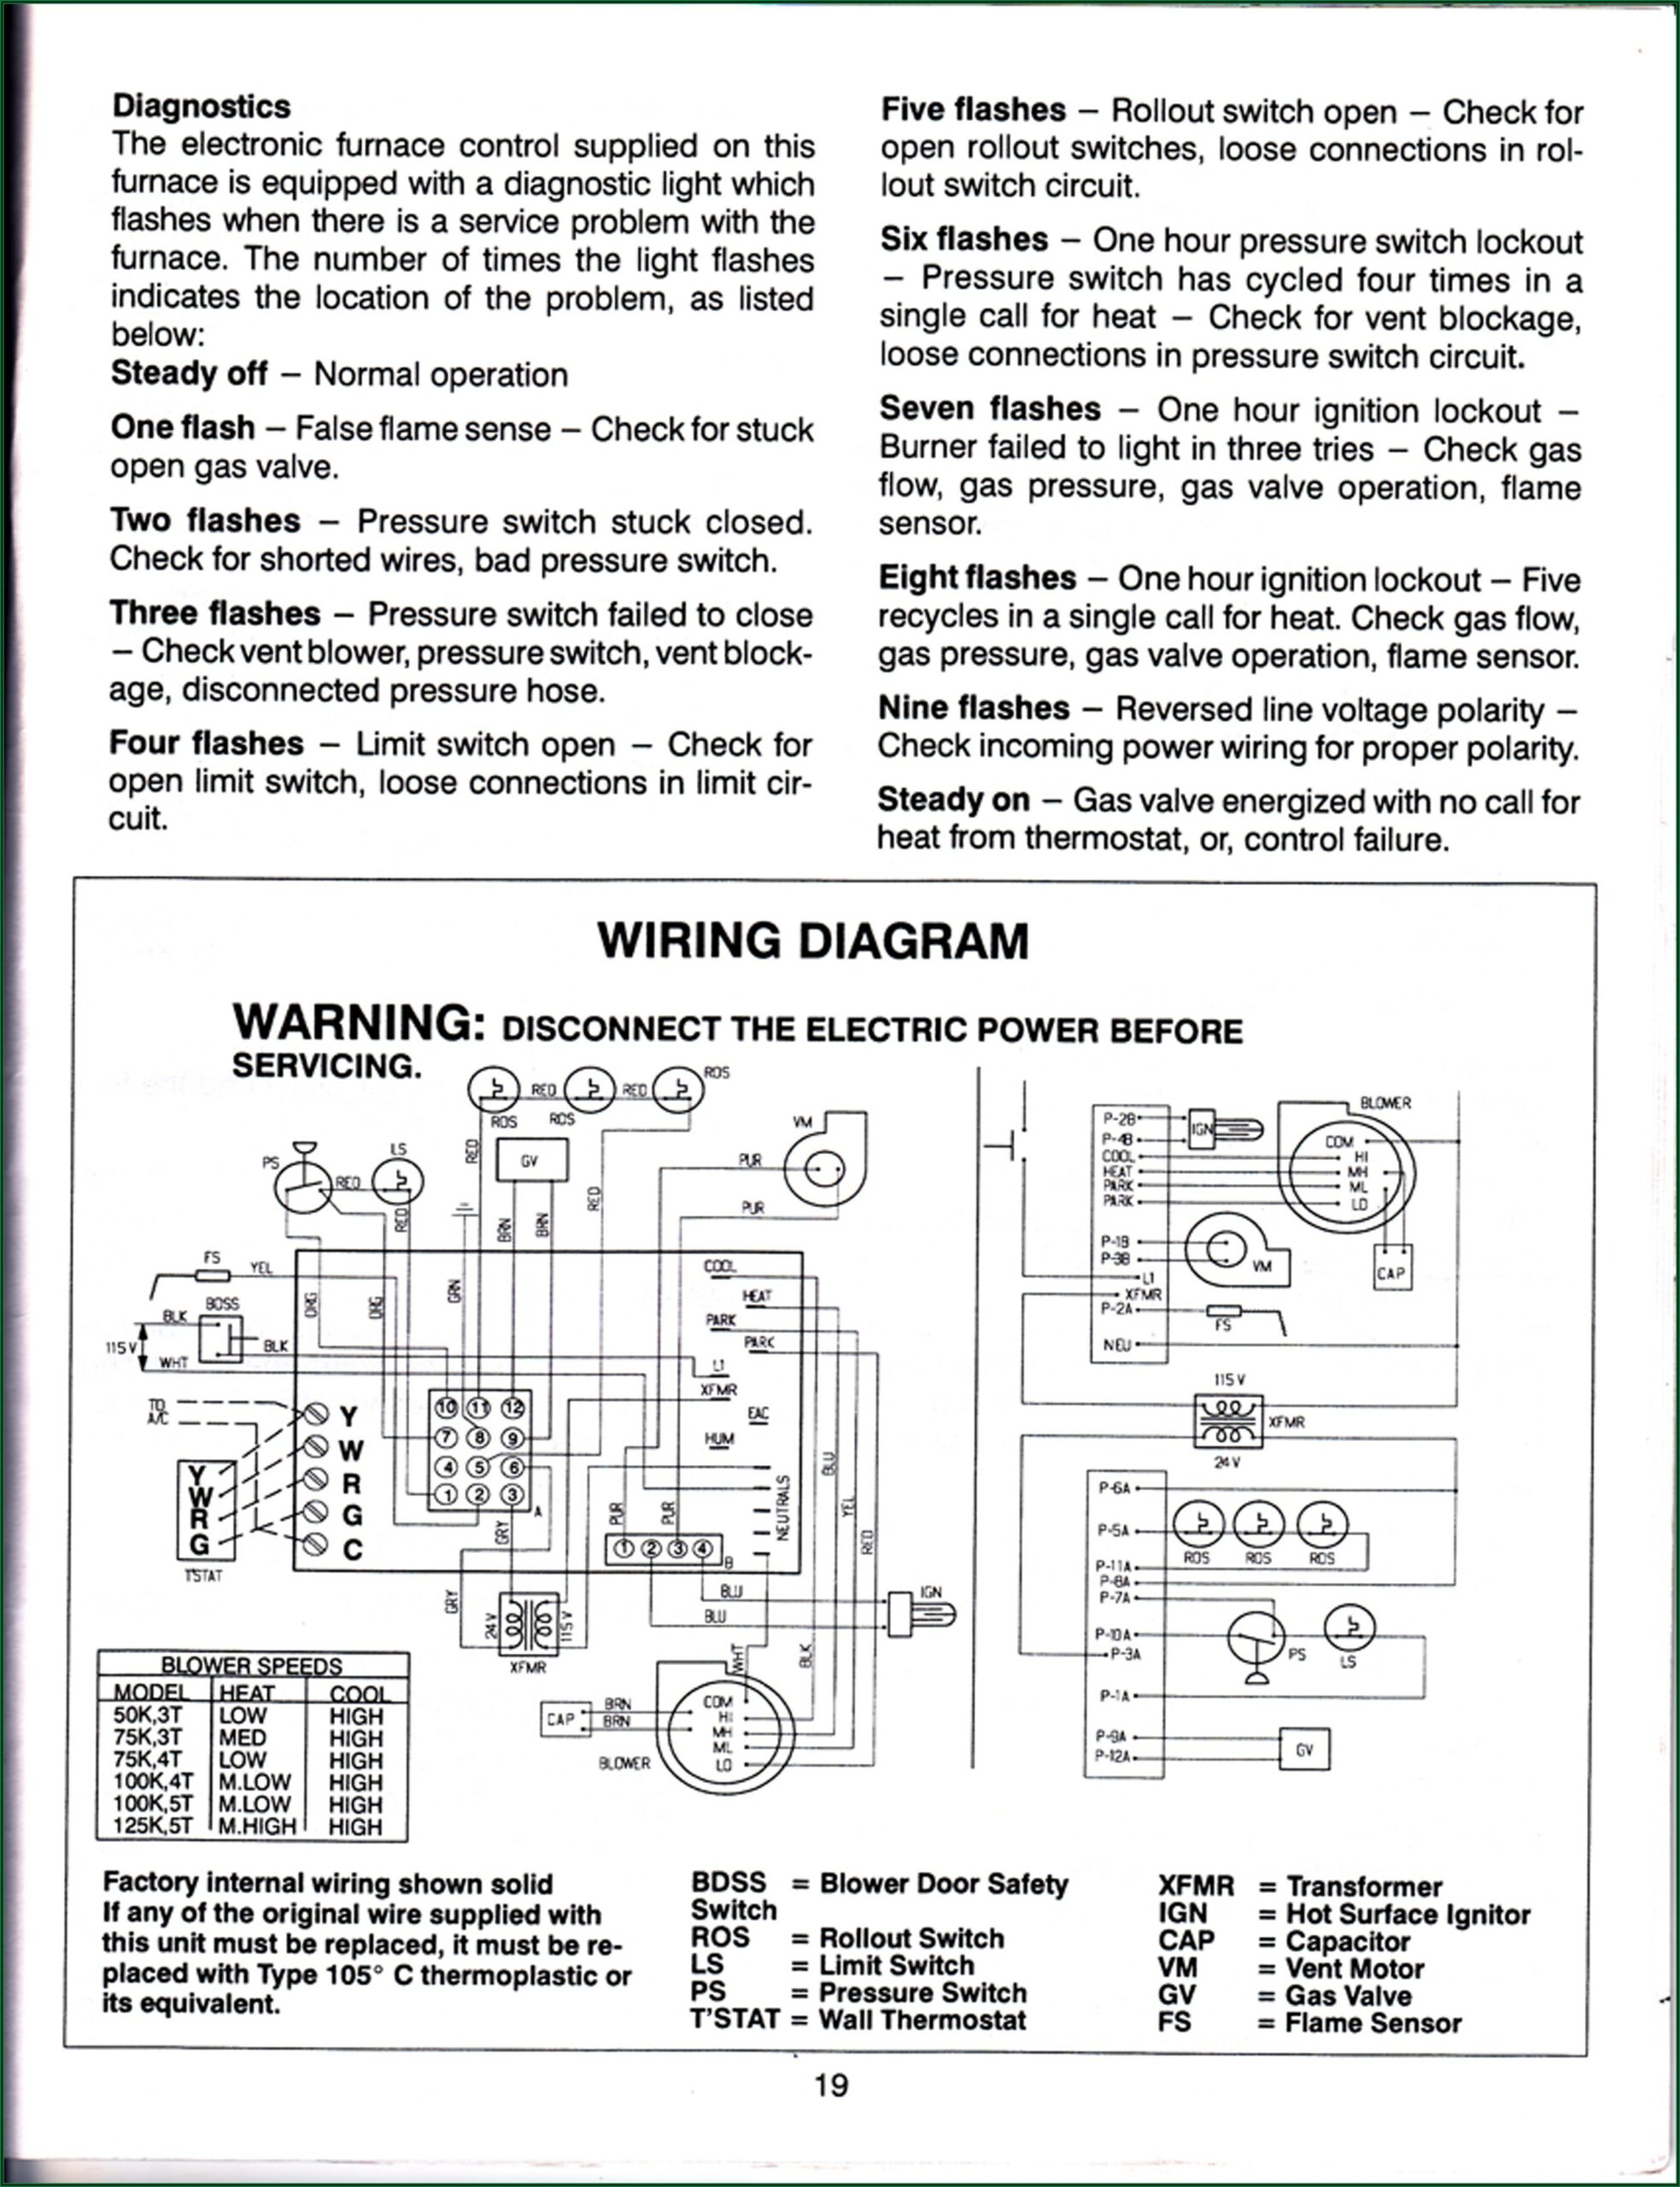 Air Compressor Capacitor Wiring Diagram